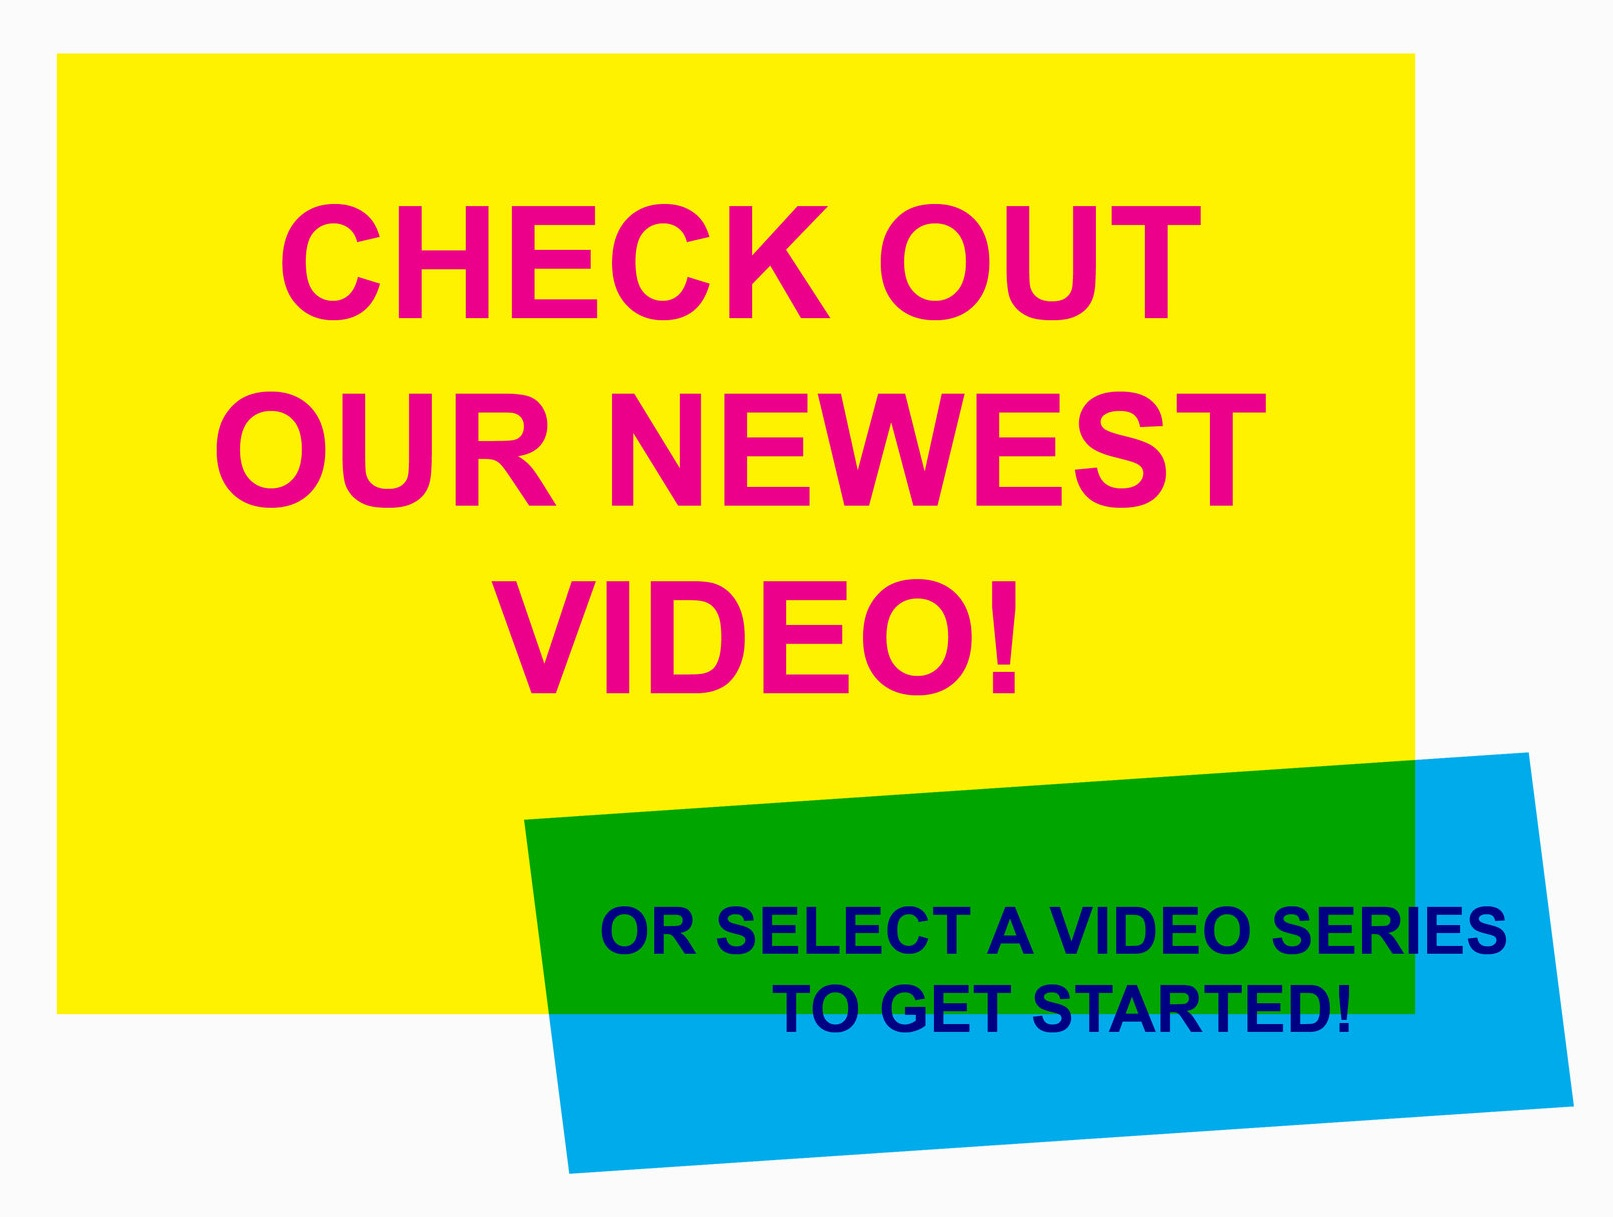 NEWEST+VIDEO+CARD.jpg